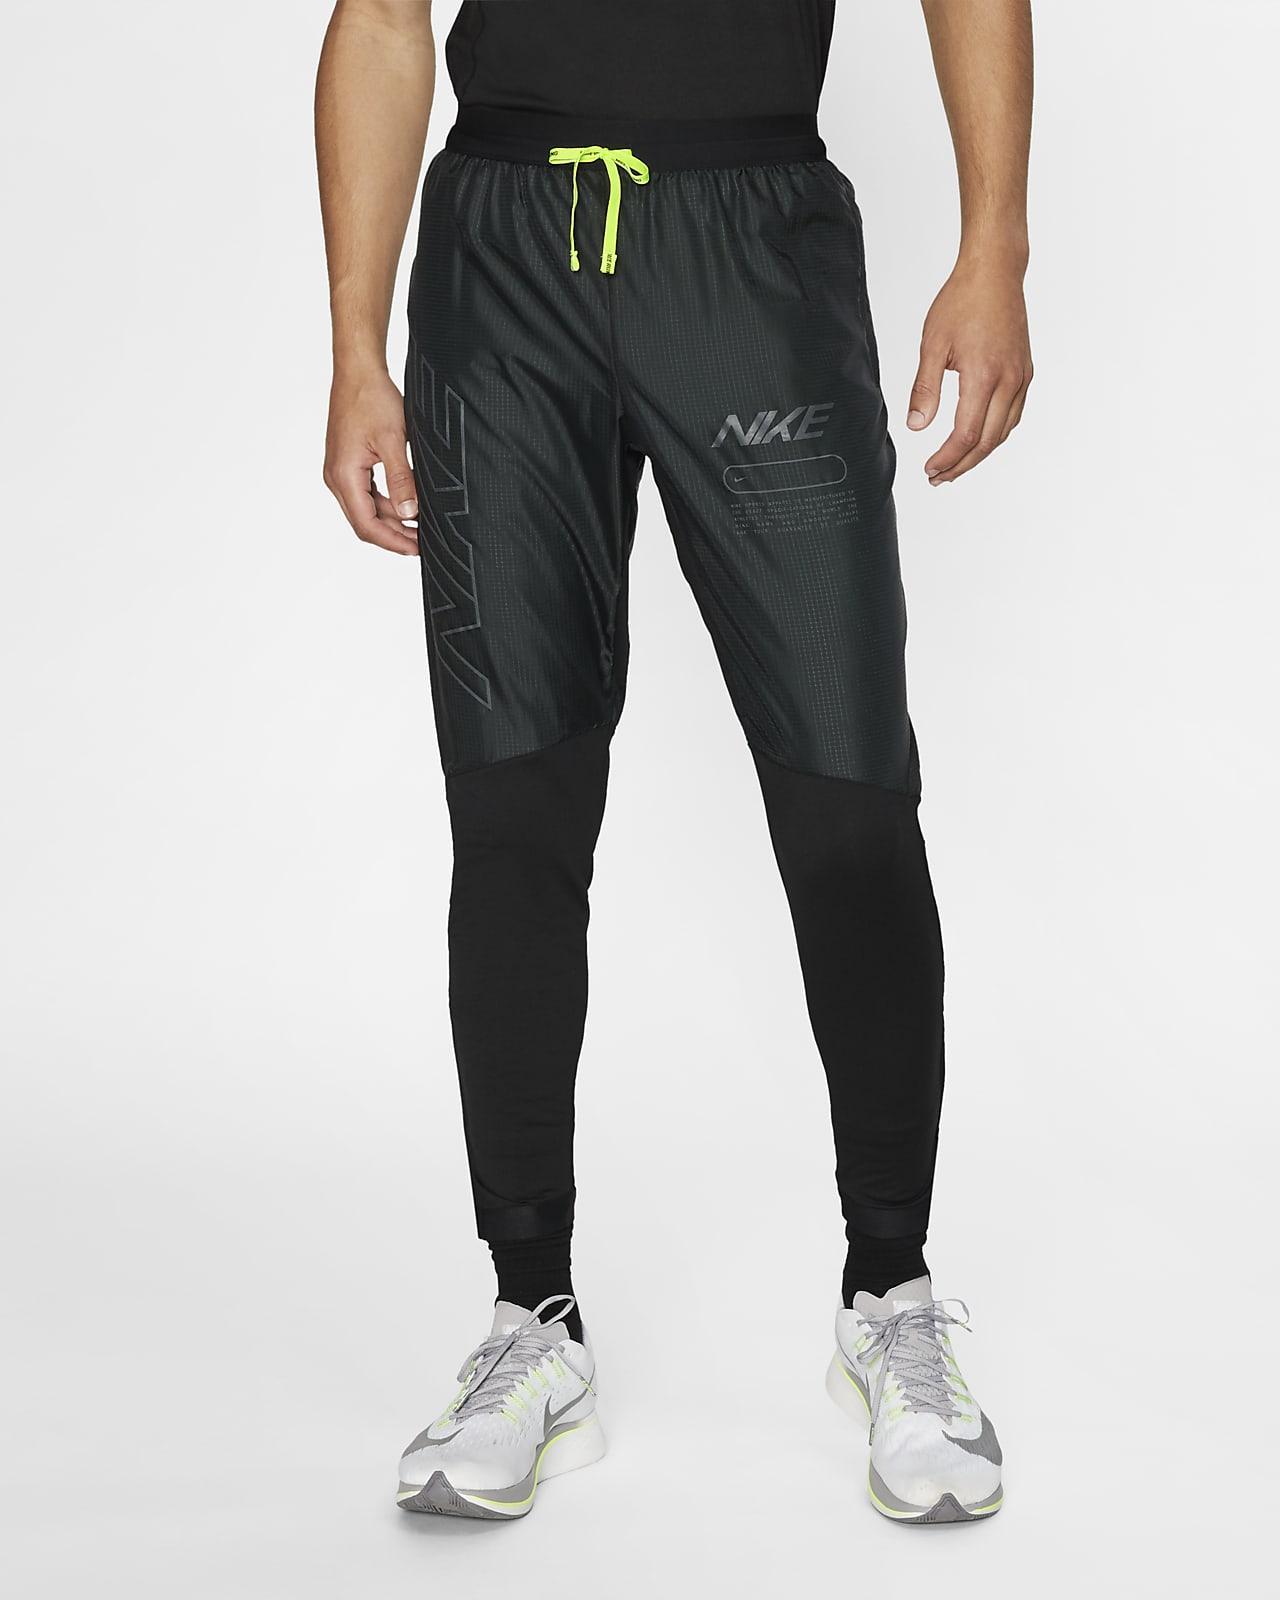 Nike Air Phenom Men's Tracksuit Bottoms